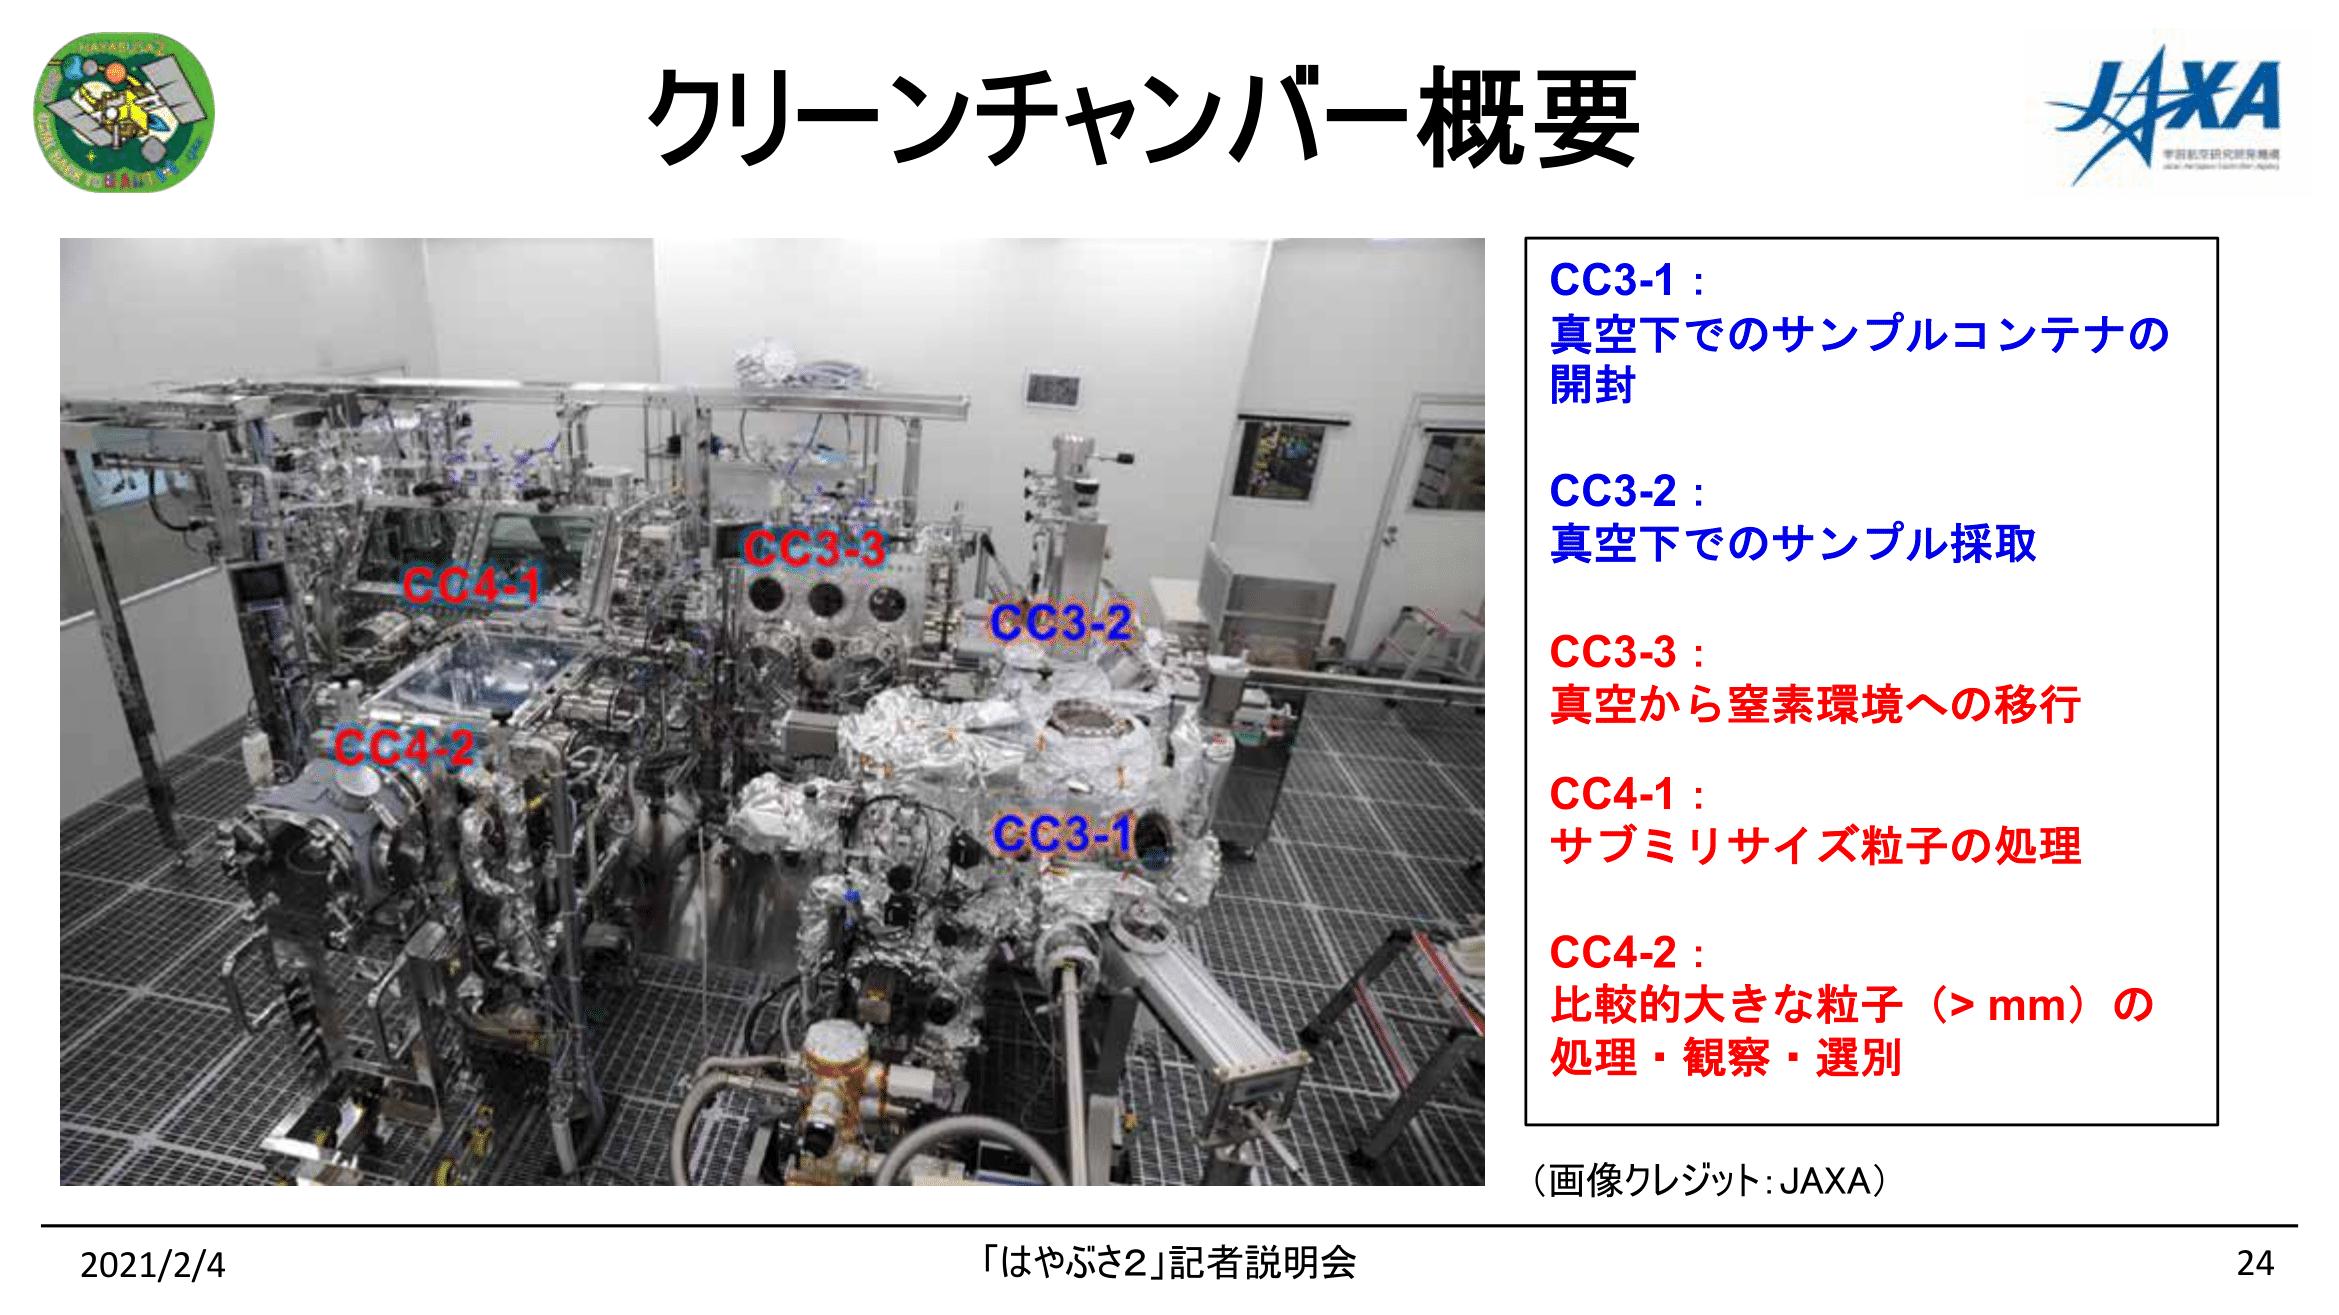 f:id:Imamura:20210204134521p:plain